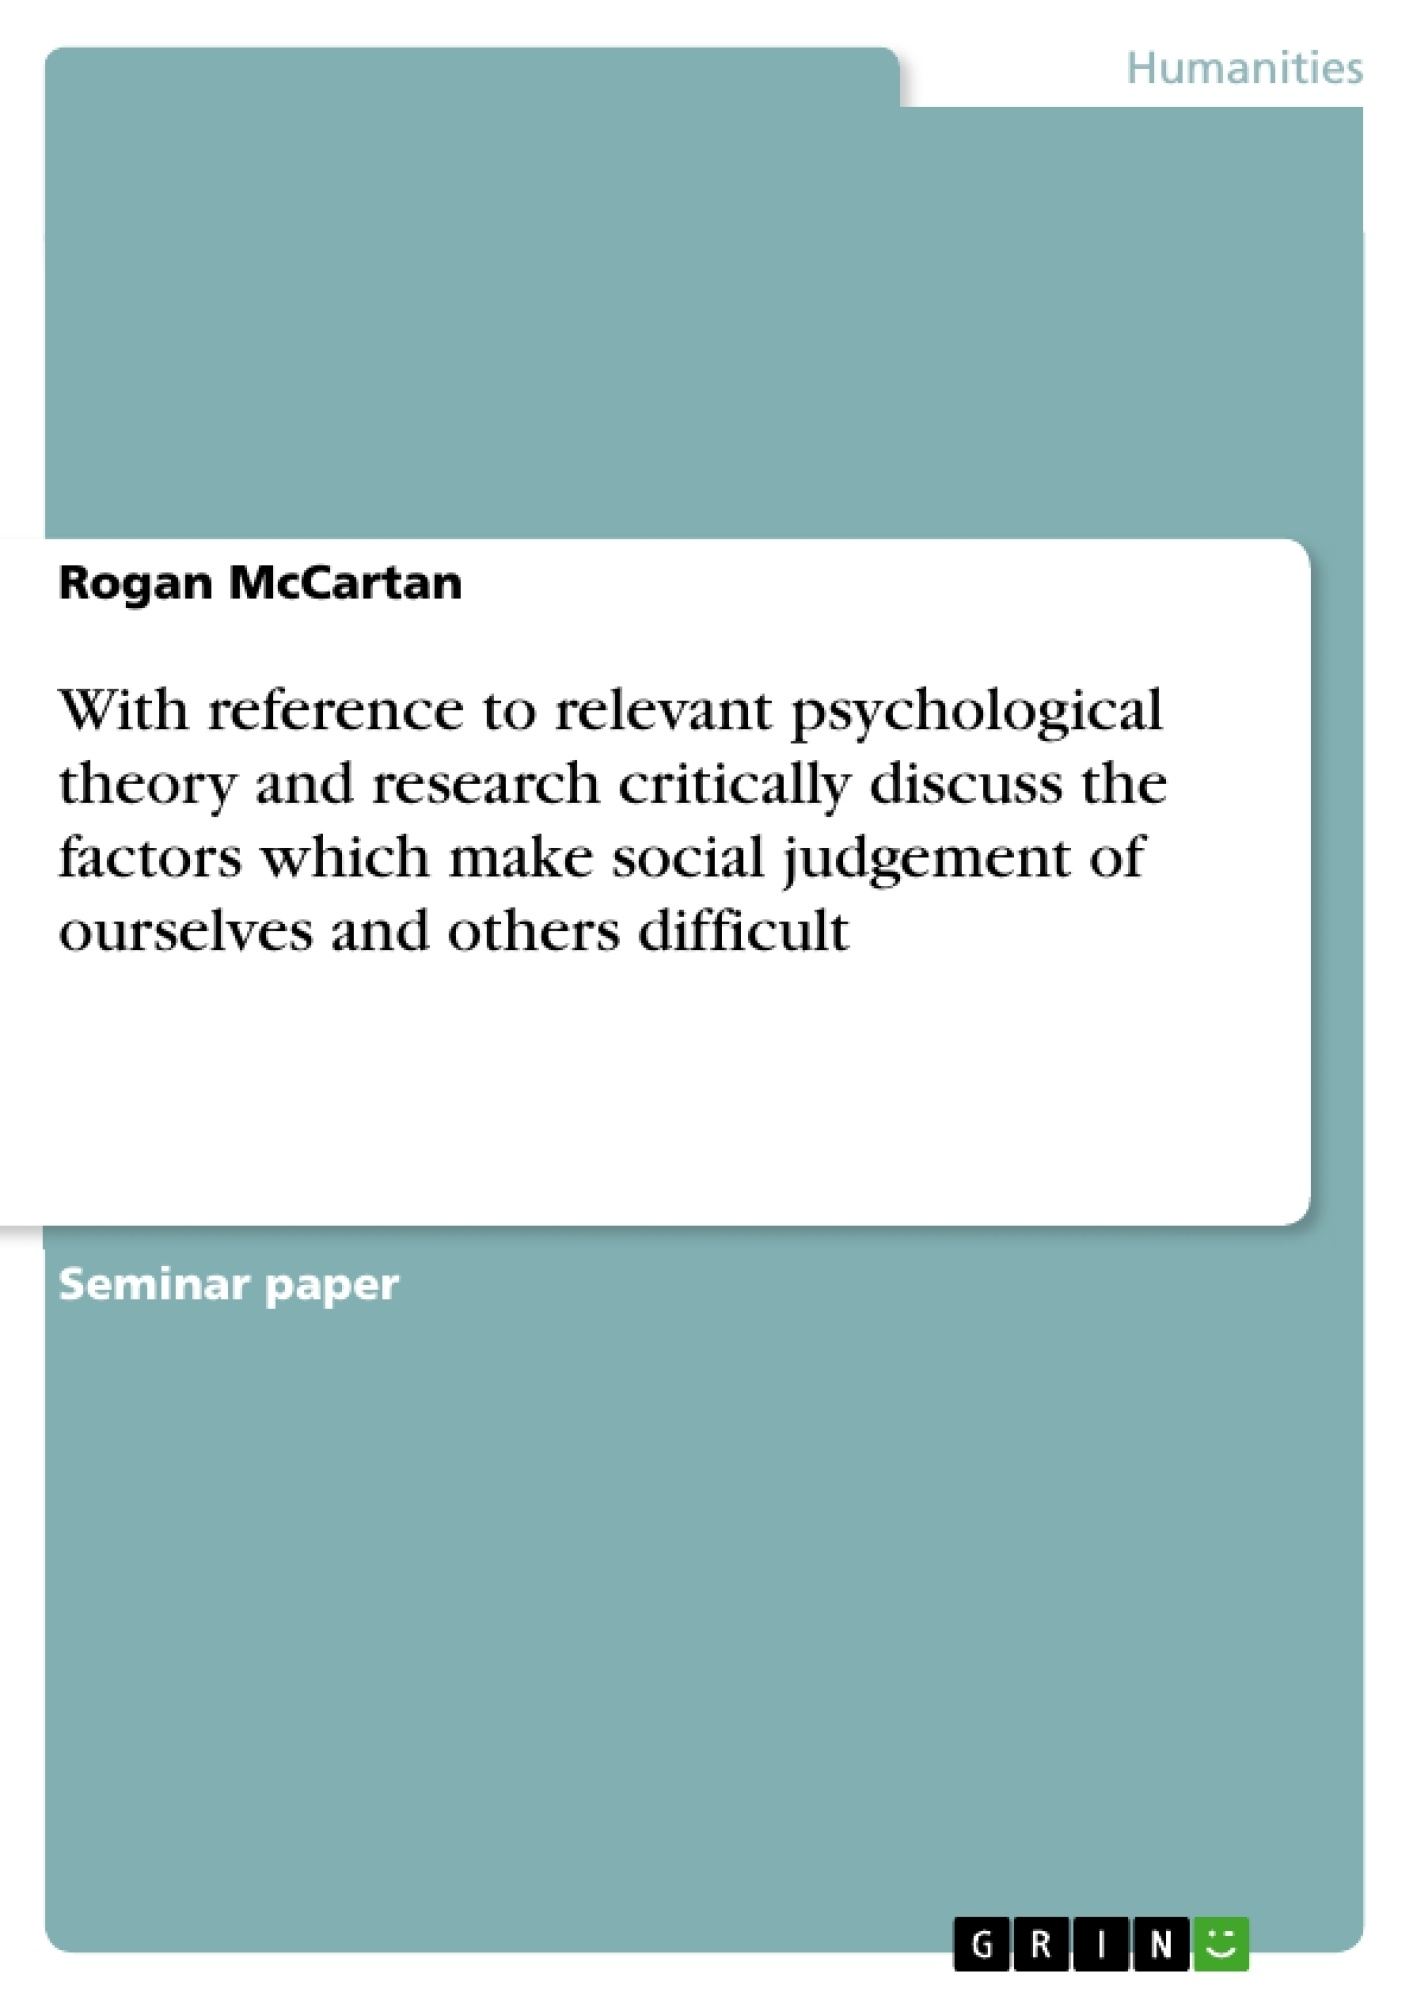 self perception and communication essay free